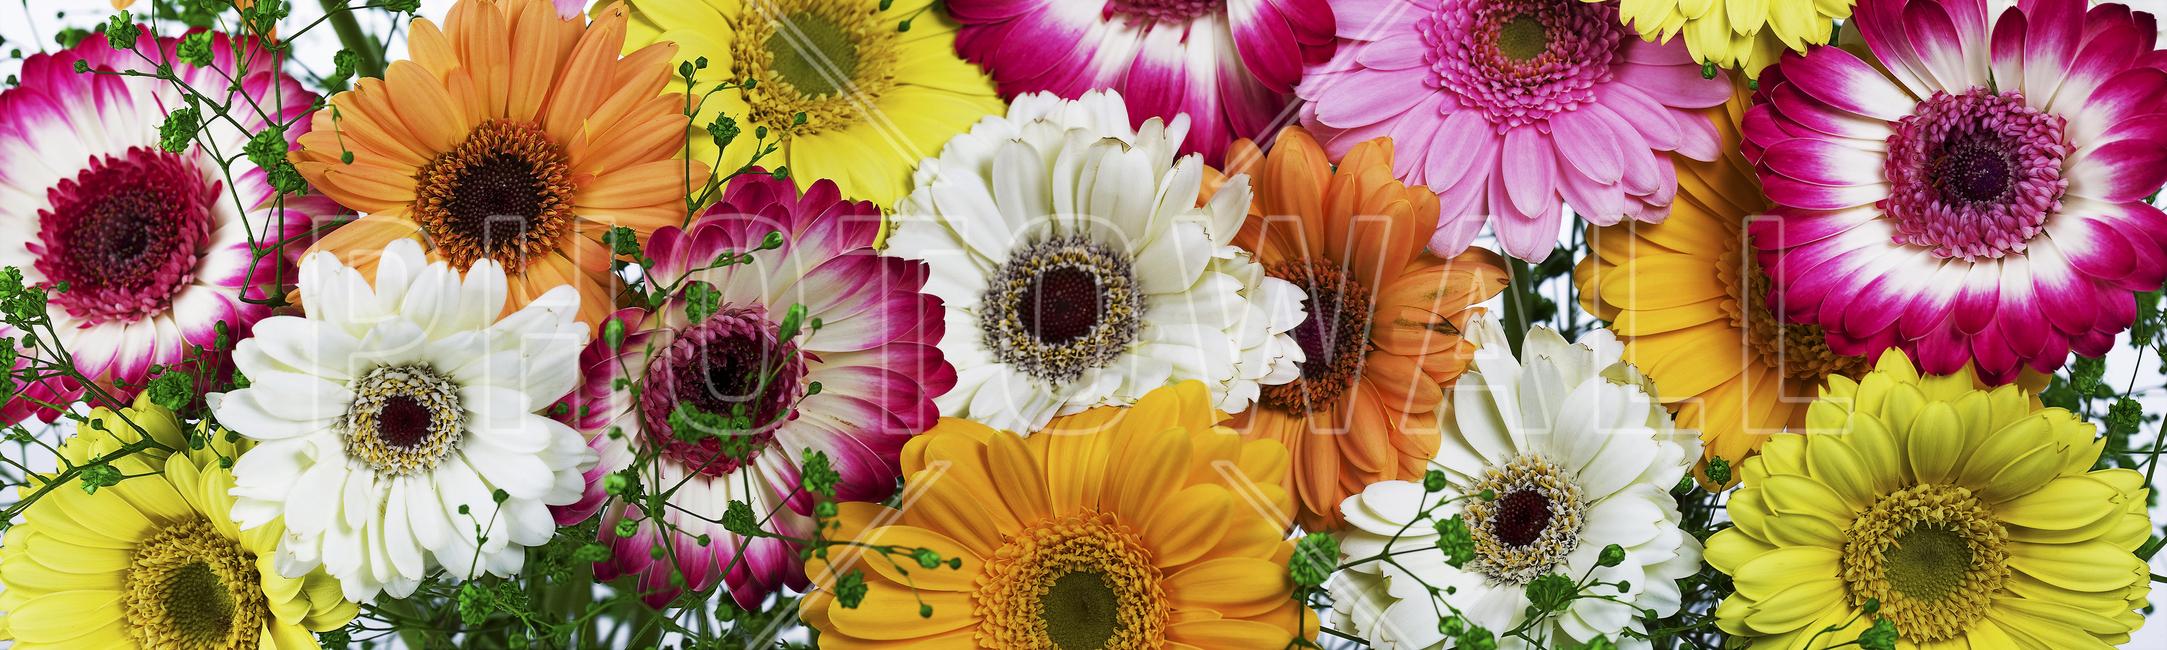 panoramic flowers colors wall mural photo wallpaper photowall panoramic flowers colors